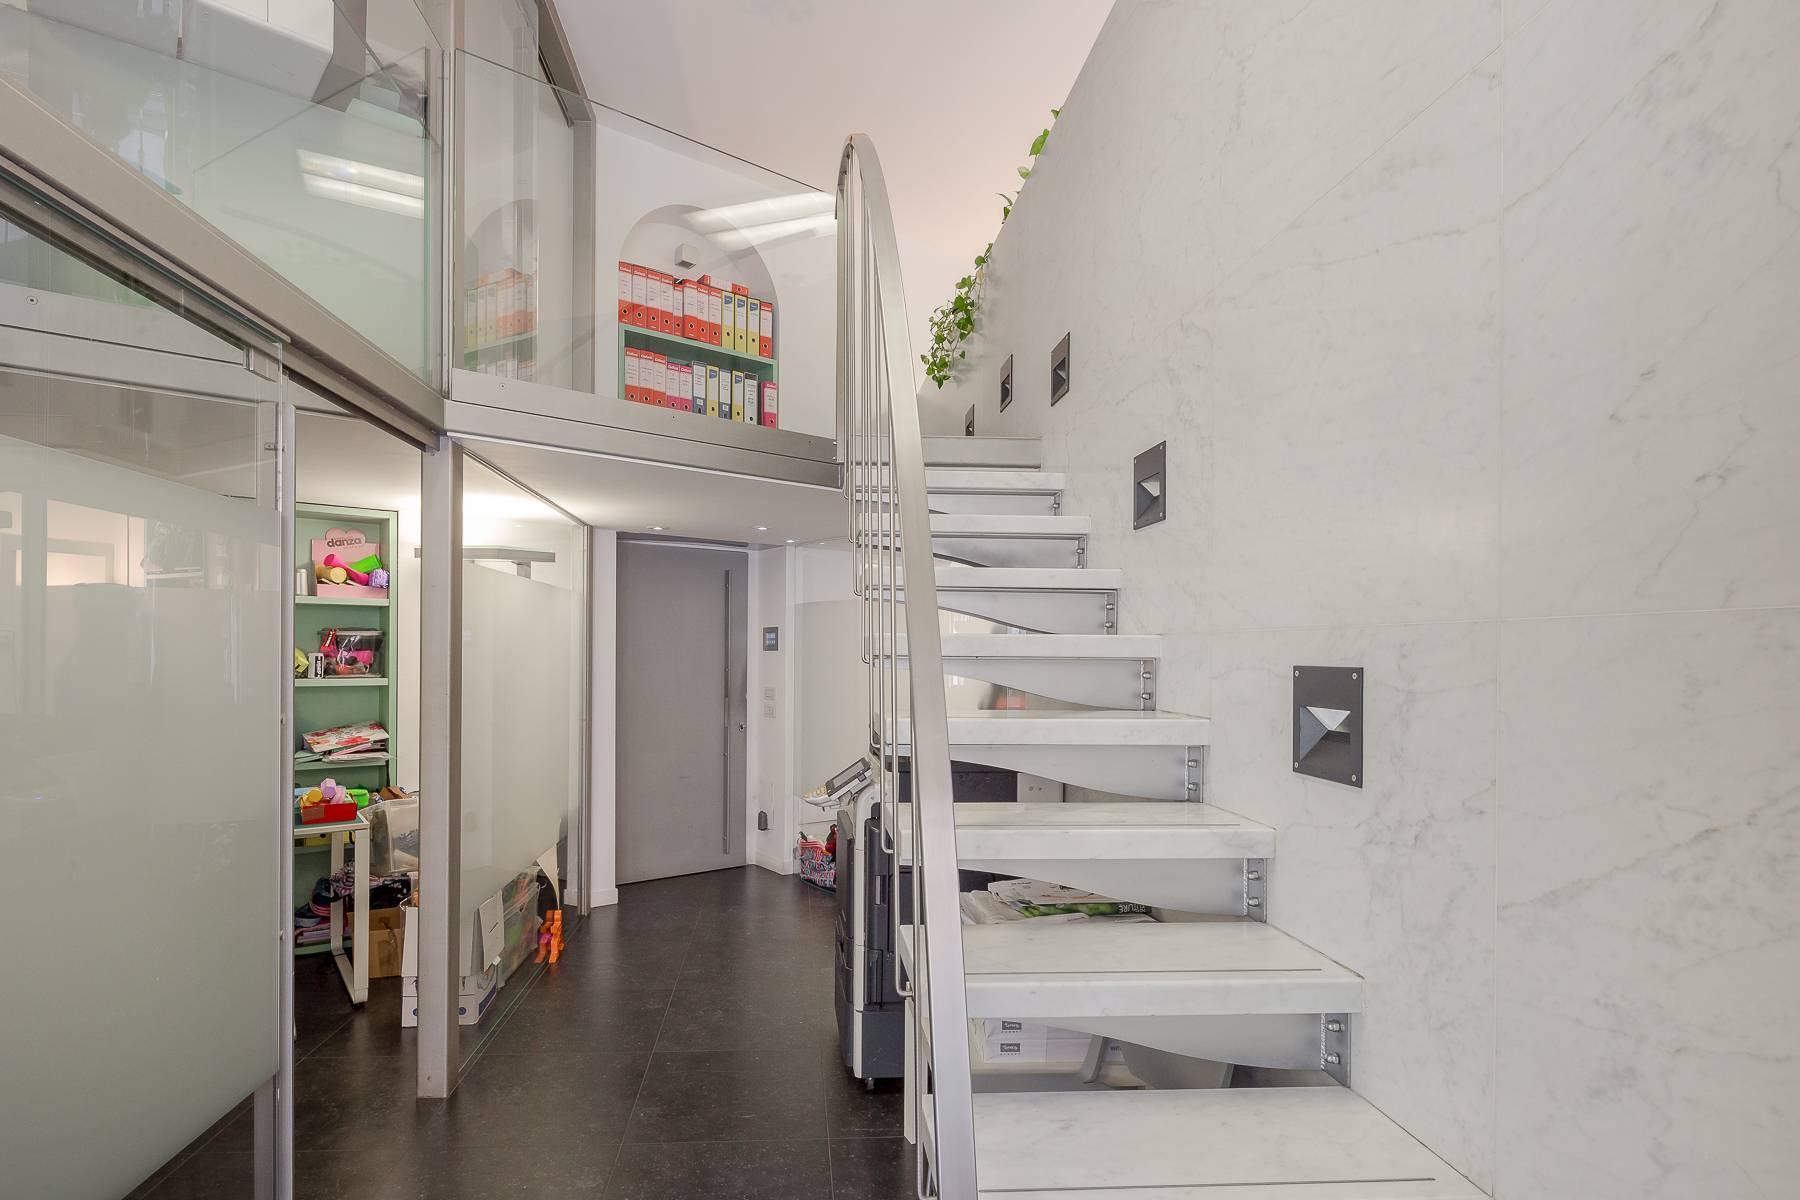 Opne-Space Büro / Wohnimmobilie auf der Piazza Giovine Italia / Via Aurelio Saffi - 9